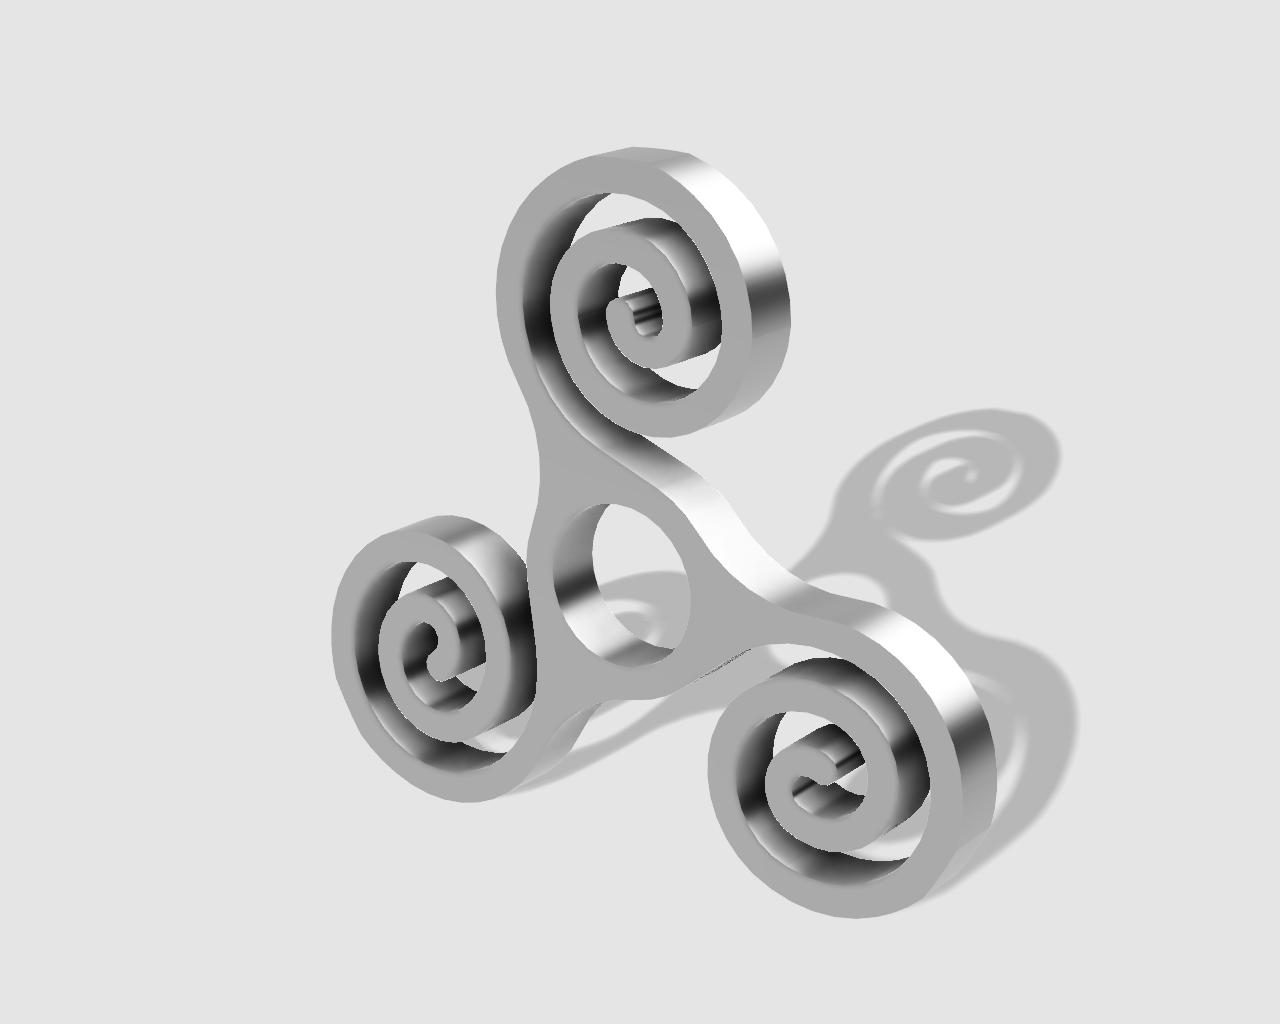 45rpm adaptor - triple spiral